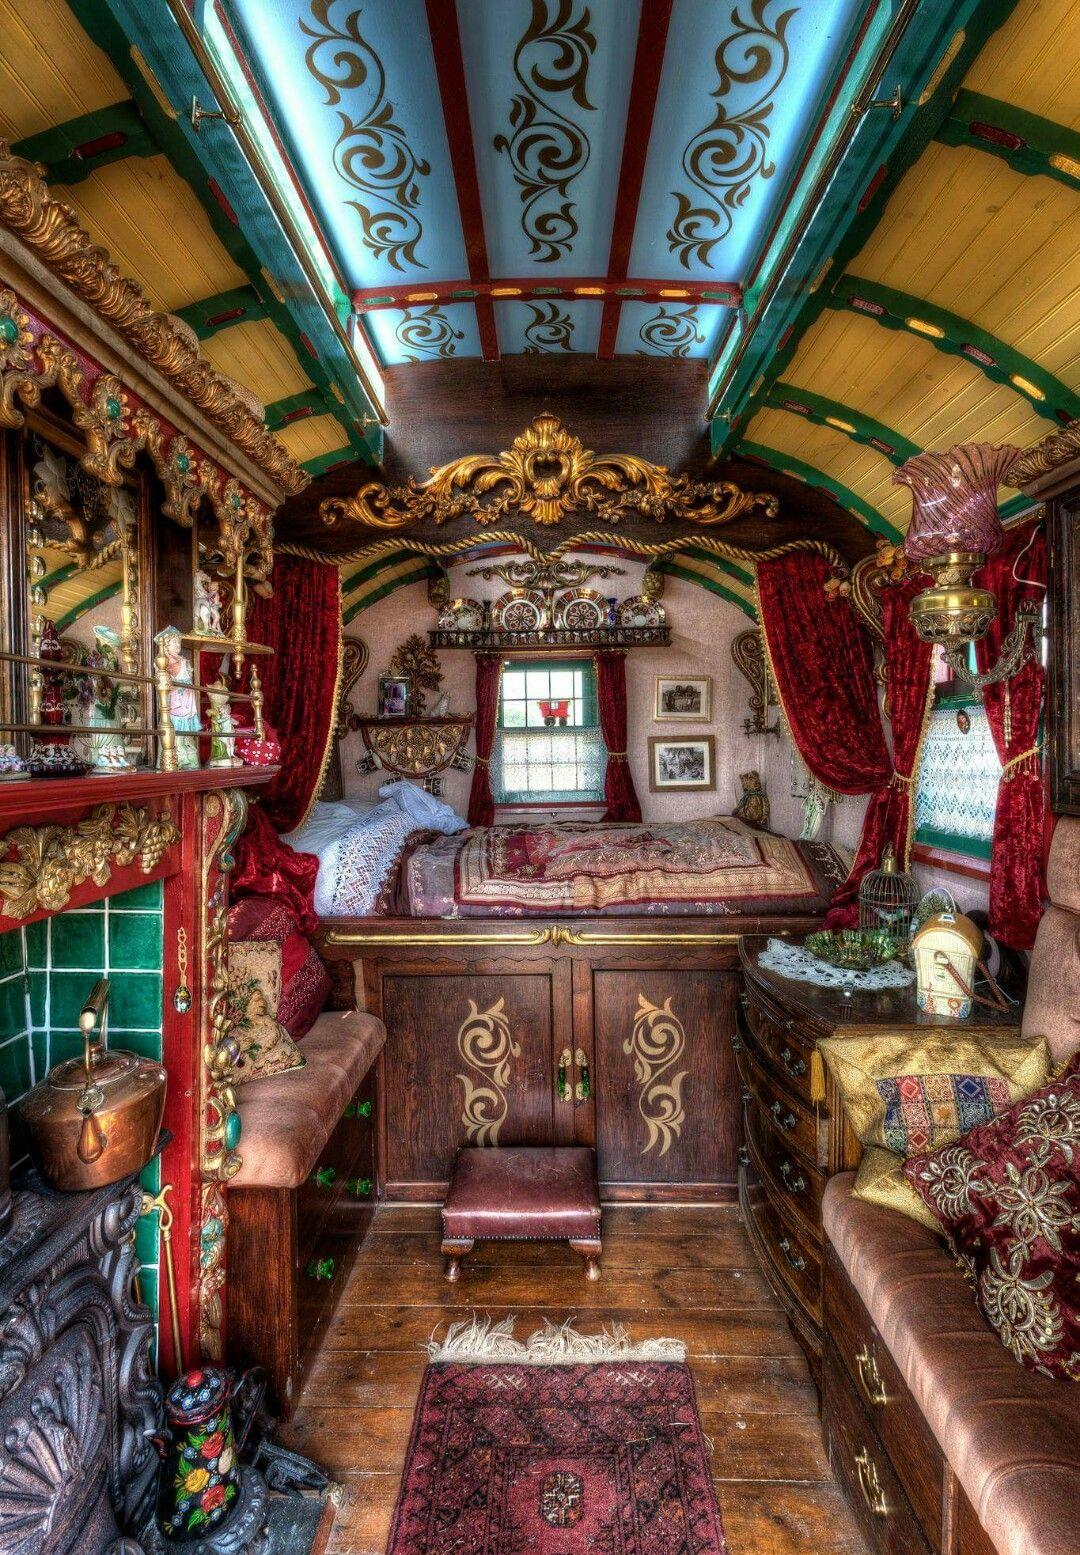 Inside gypsy caravan, Faerie magazine | Magical and ...